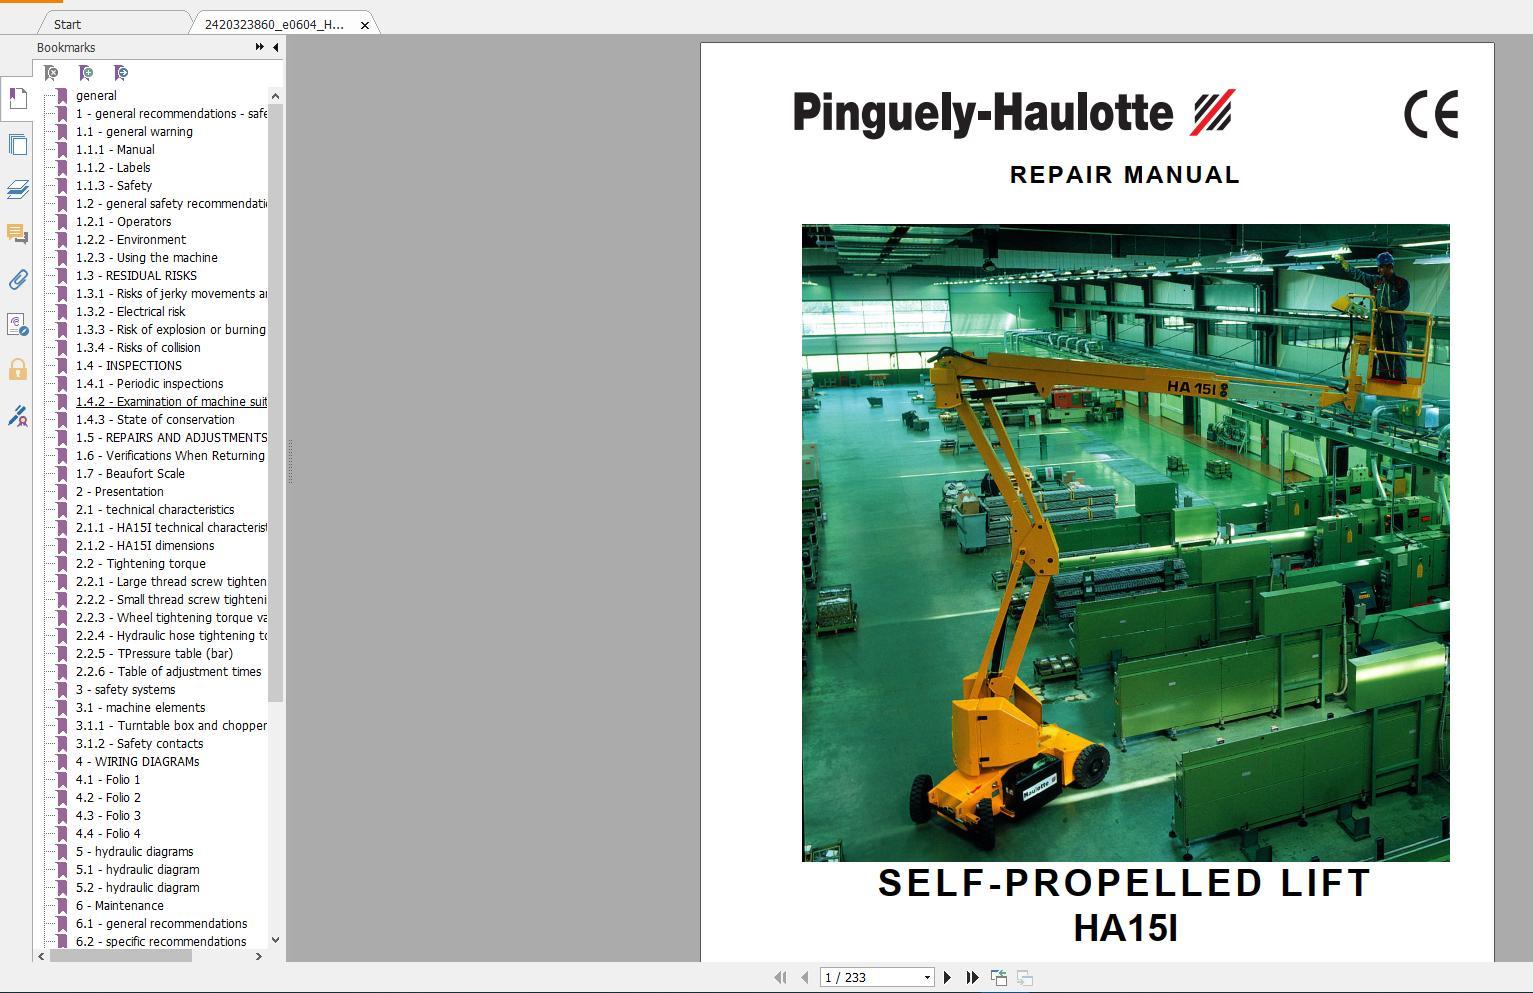 Haulotte_Work_Platforms_and_Telehandlers_Service_Maintenance_Operators_Manual_Training_Spare_Parts_Manual_DVD17